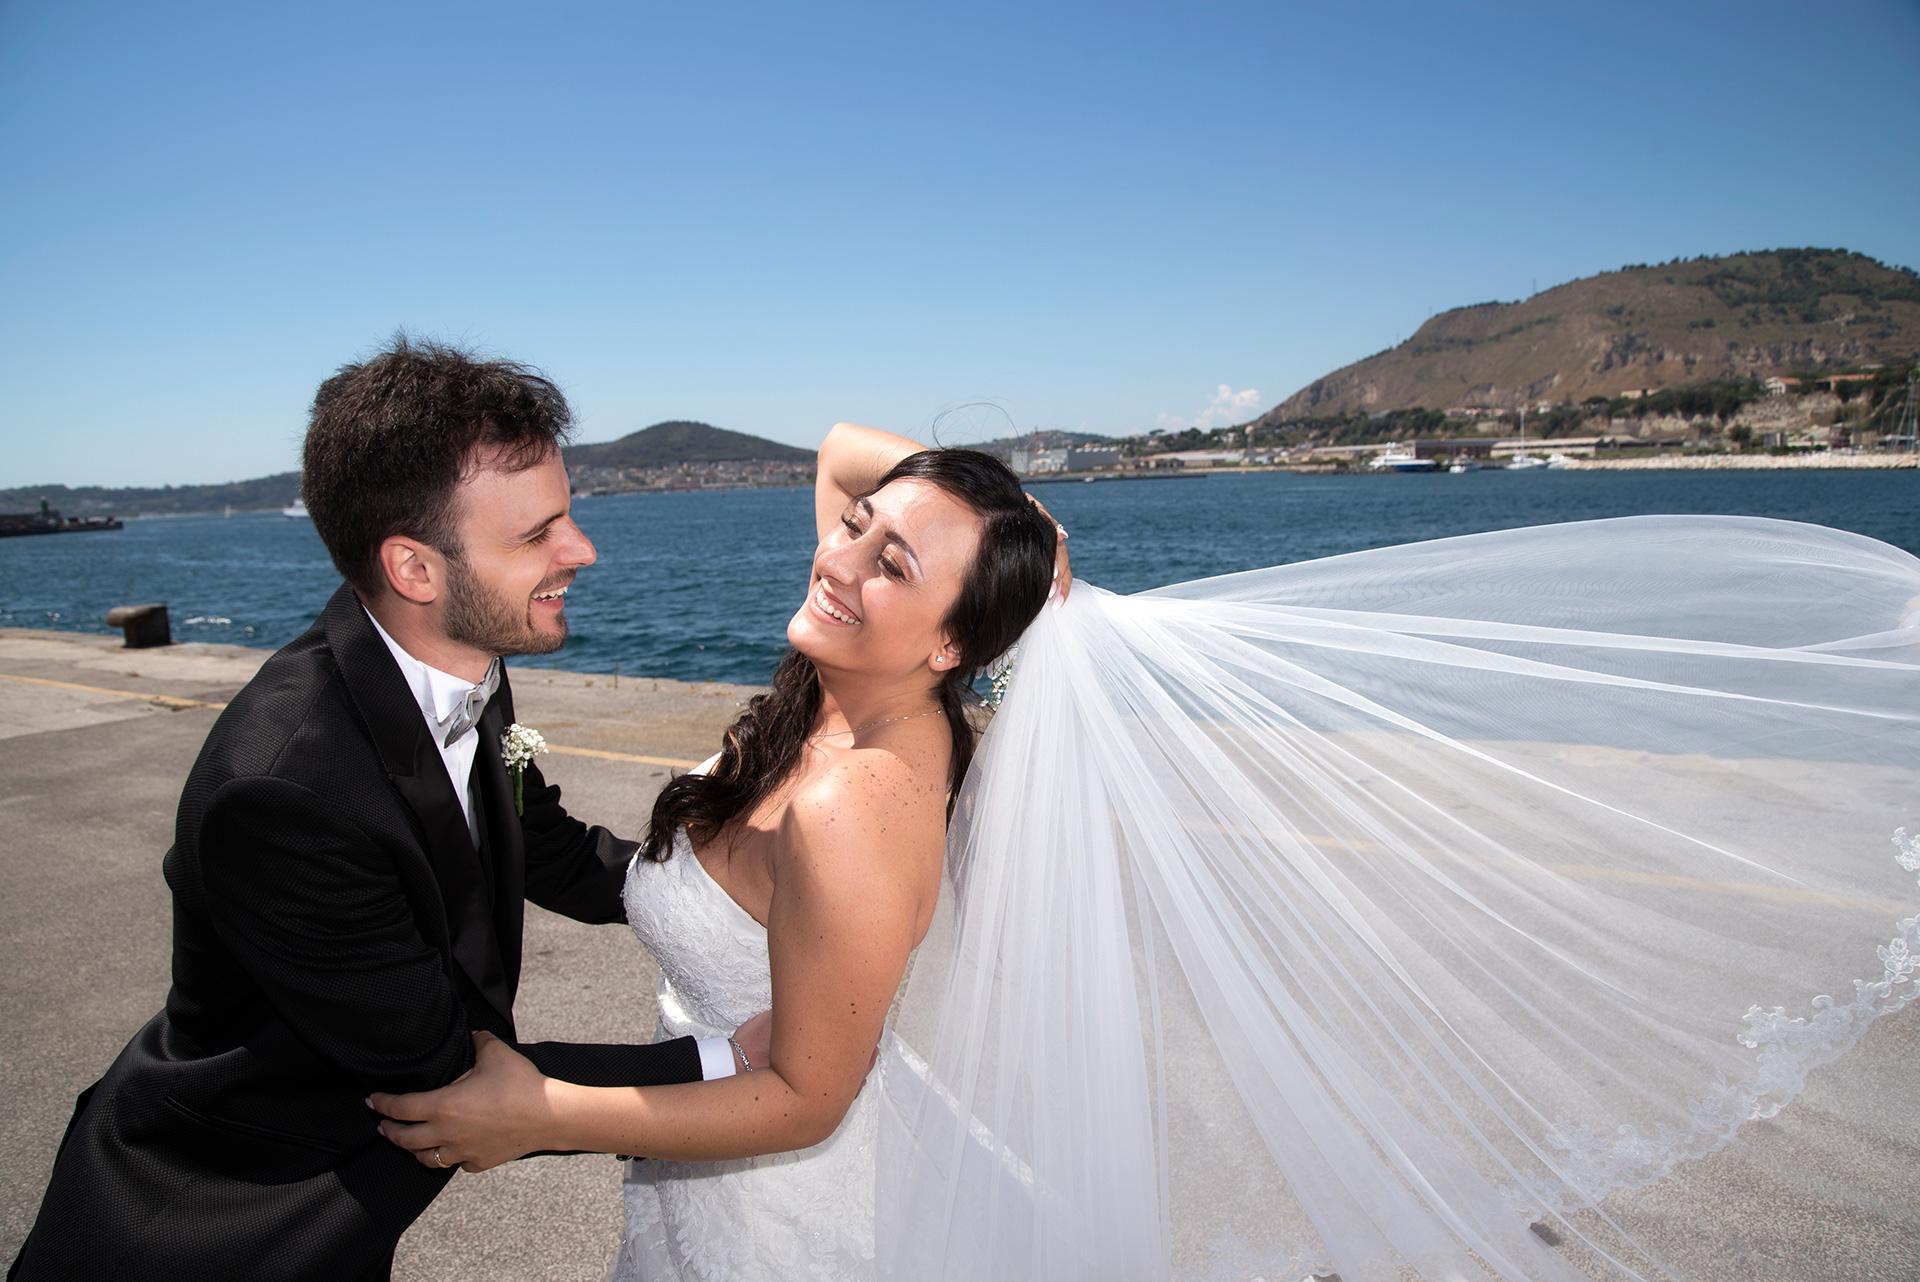 Fotografo Matrimonio: Stefano Cardone Fotografo